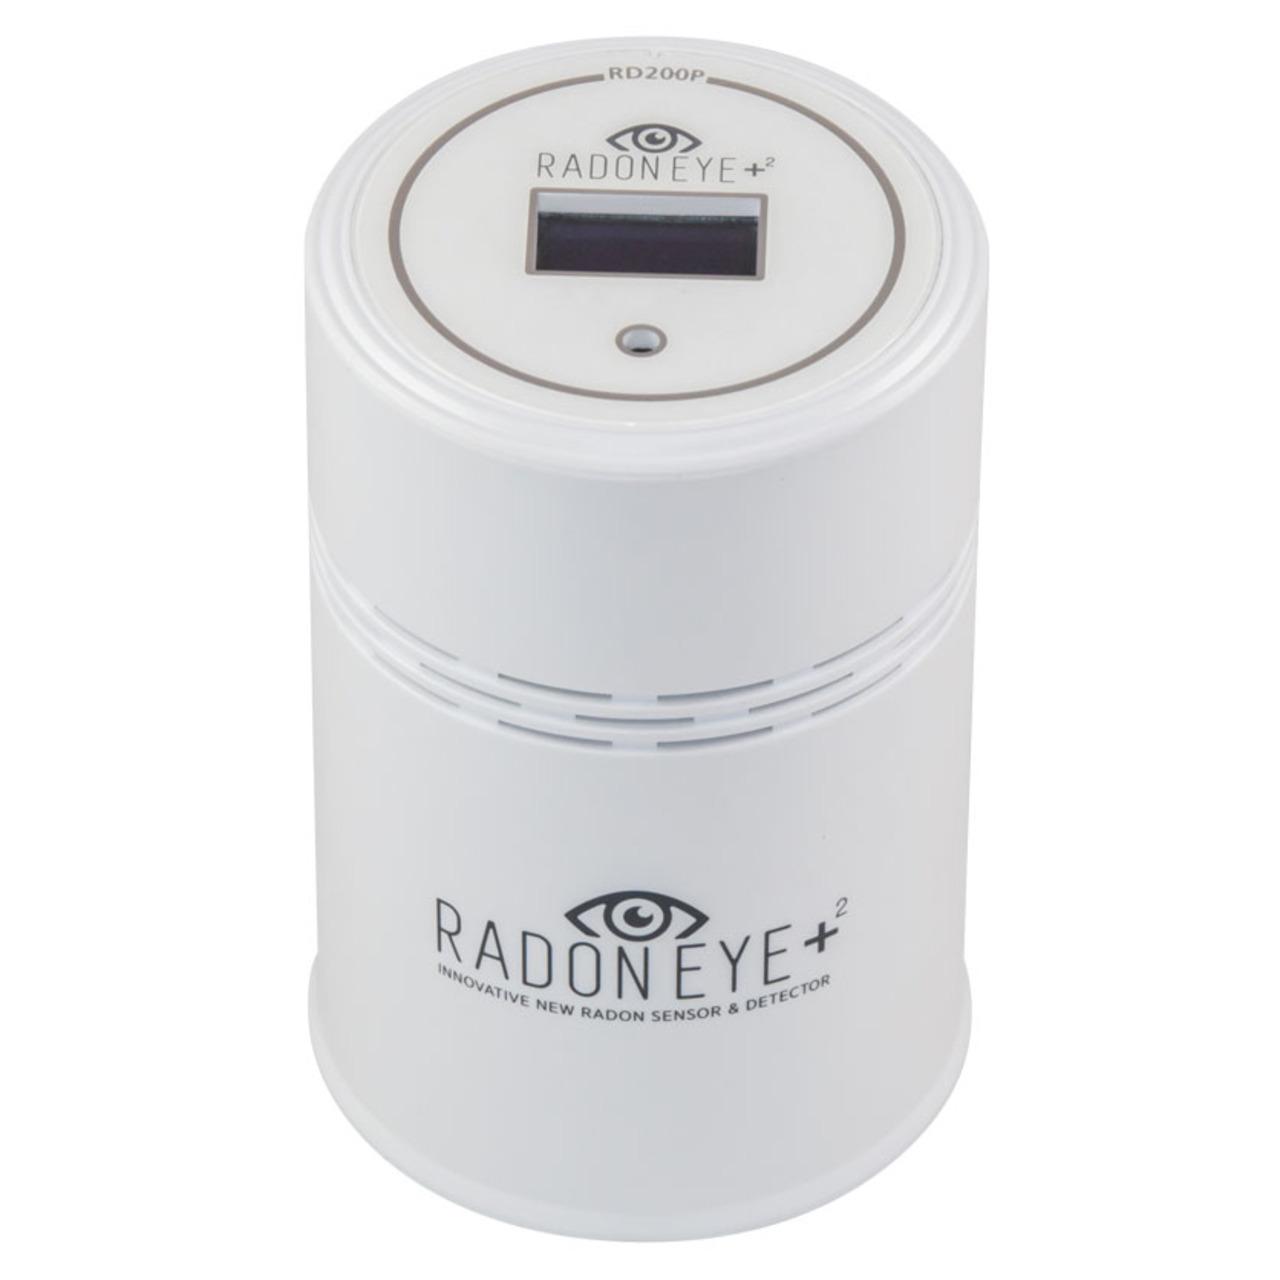 FTLAB Radon-Messgerät - Radon-Monitor RadonEye PLUS- - RD200P2